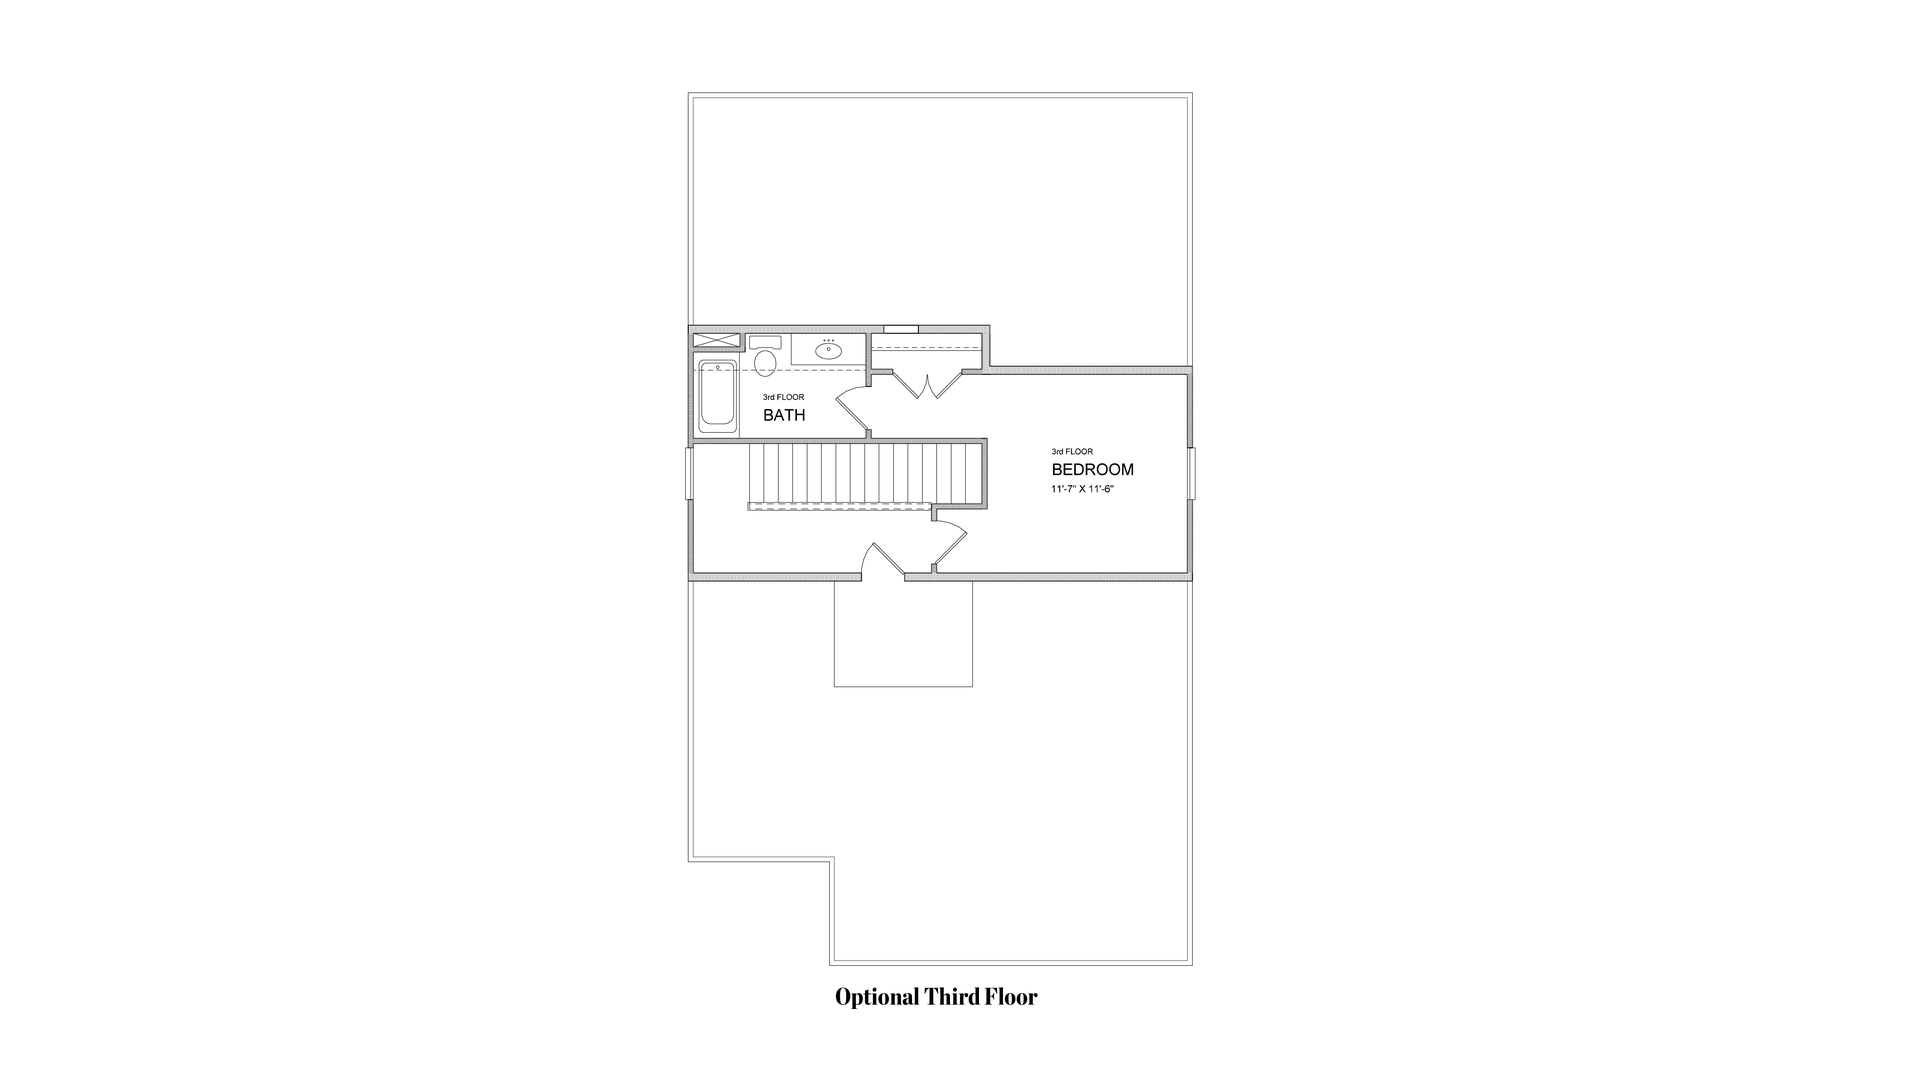 2,229sf New Home in Suwanee, GA